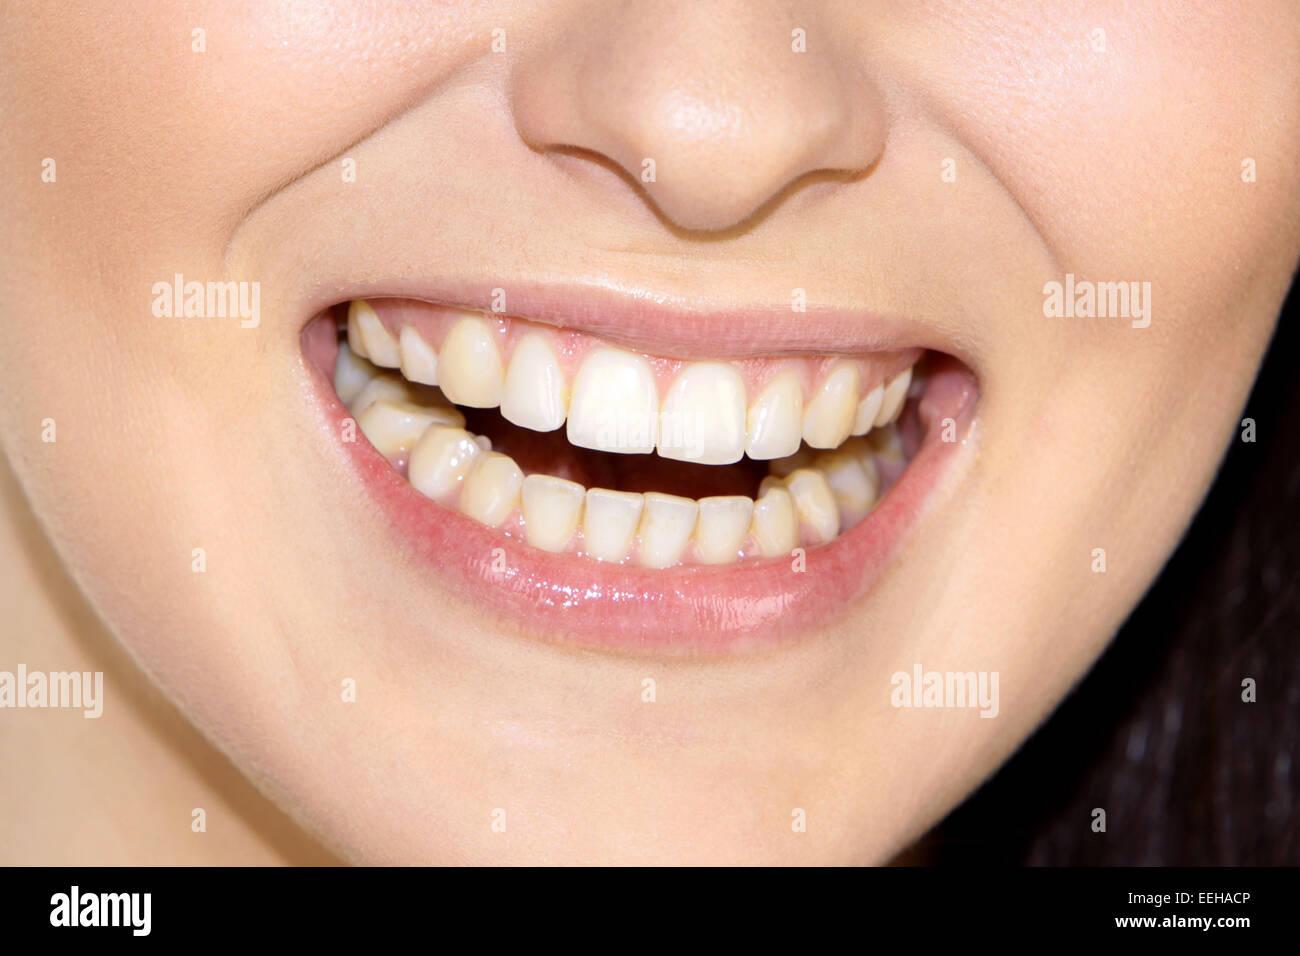 Frau, Jung, Laecheln, Detail, Munder, Nahaufnahme, Innen, Zahn, Zaehne, Lippen, angetreten, Schoenheit, Schönheit, Stockbild